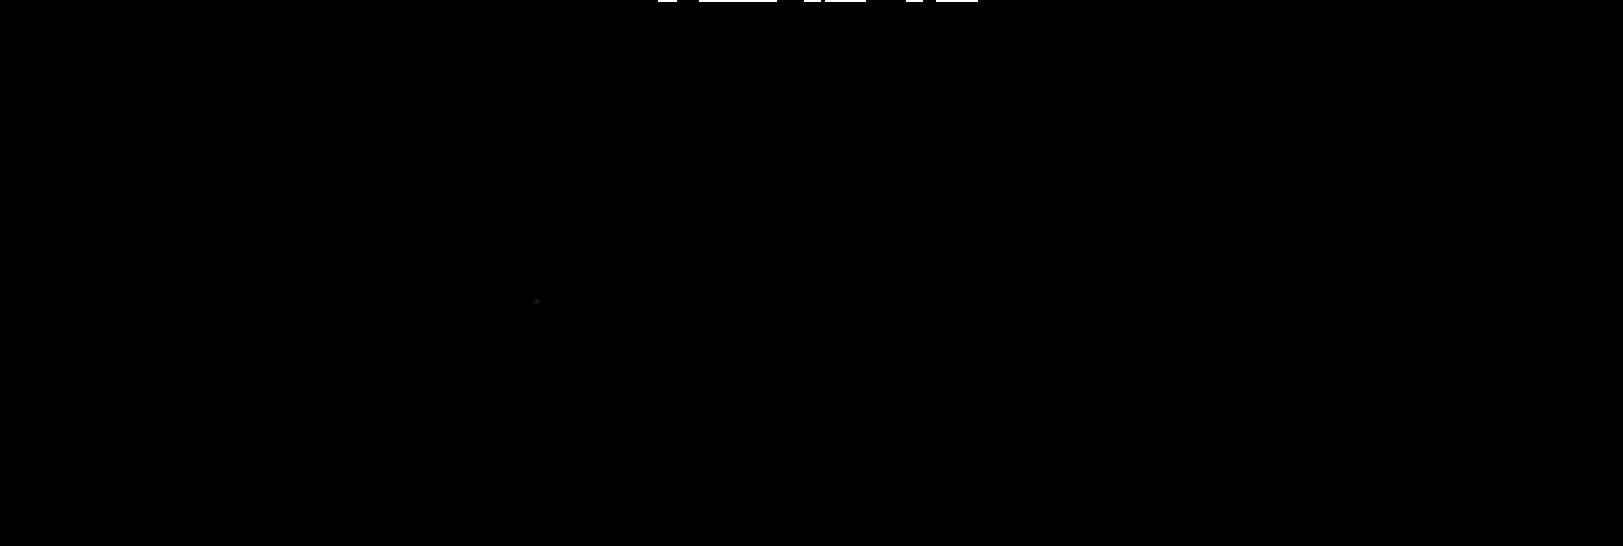 http://thedutchthrowdown.nl/wp-content/uploads/2018/12/getitat_cfbraces_logo_black-e1544181026410.png